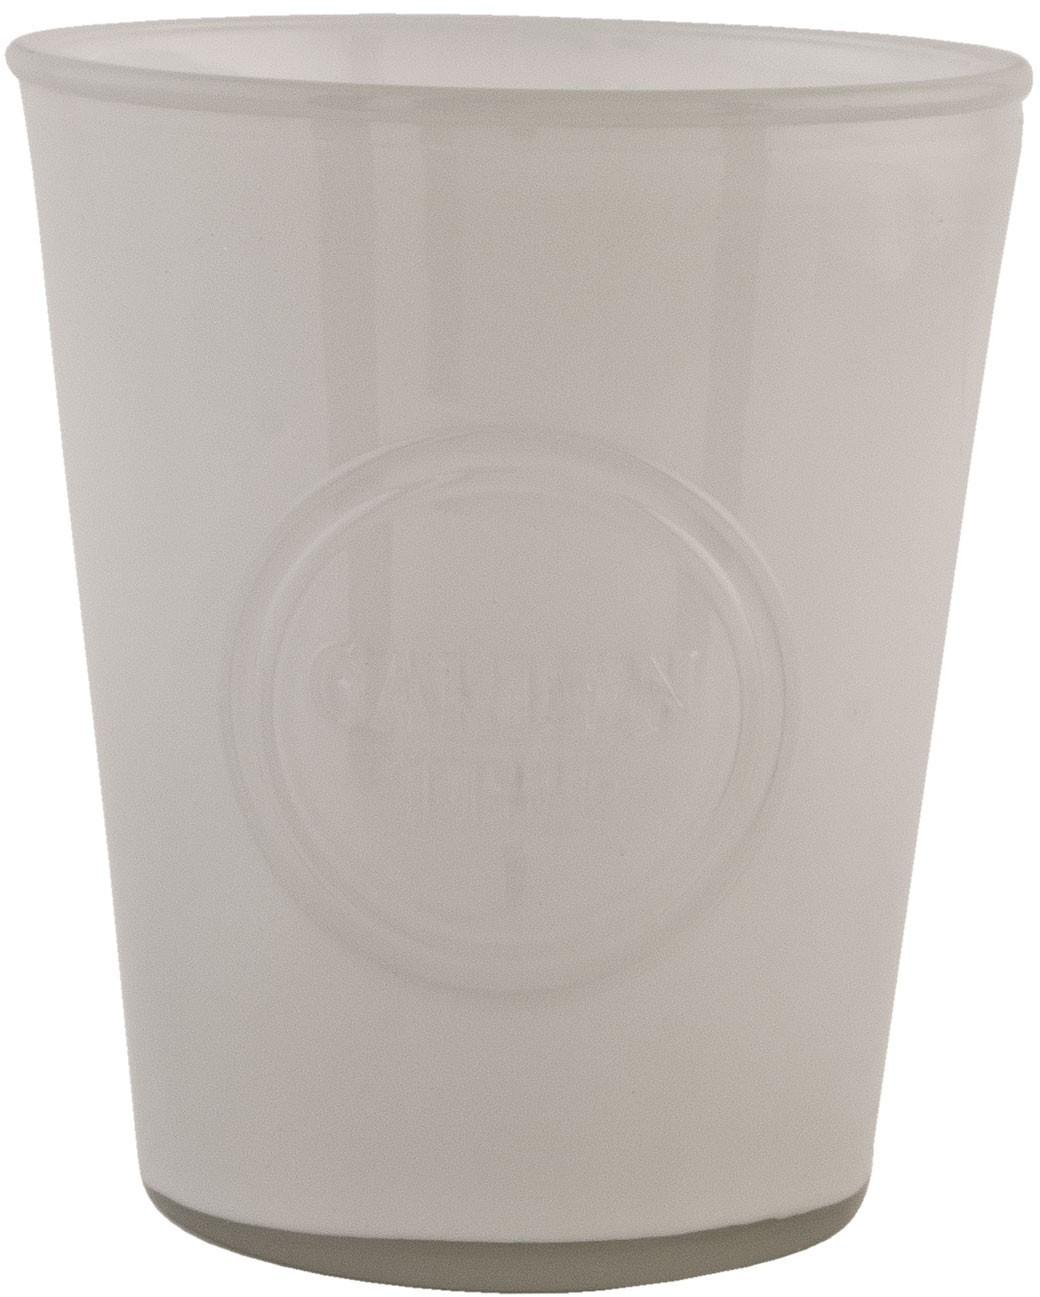 Sklenený svietnik na čajovú sviečku - Ø 14 * 16 cm